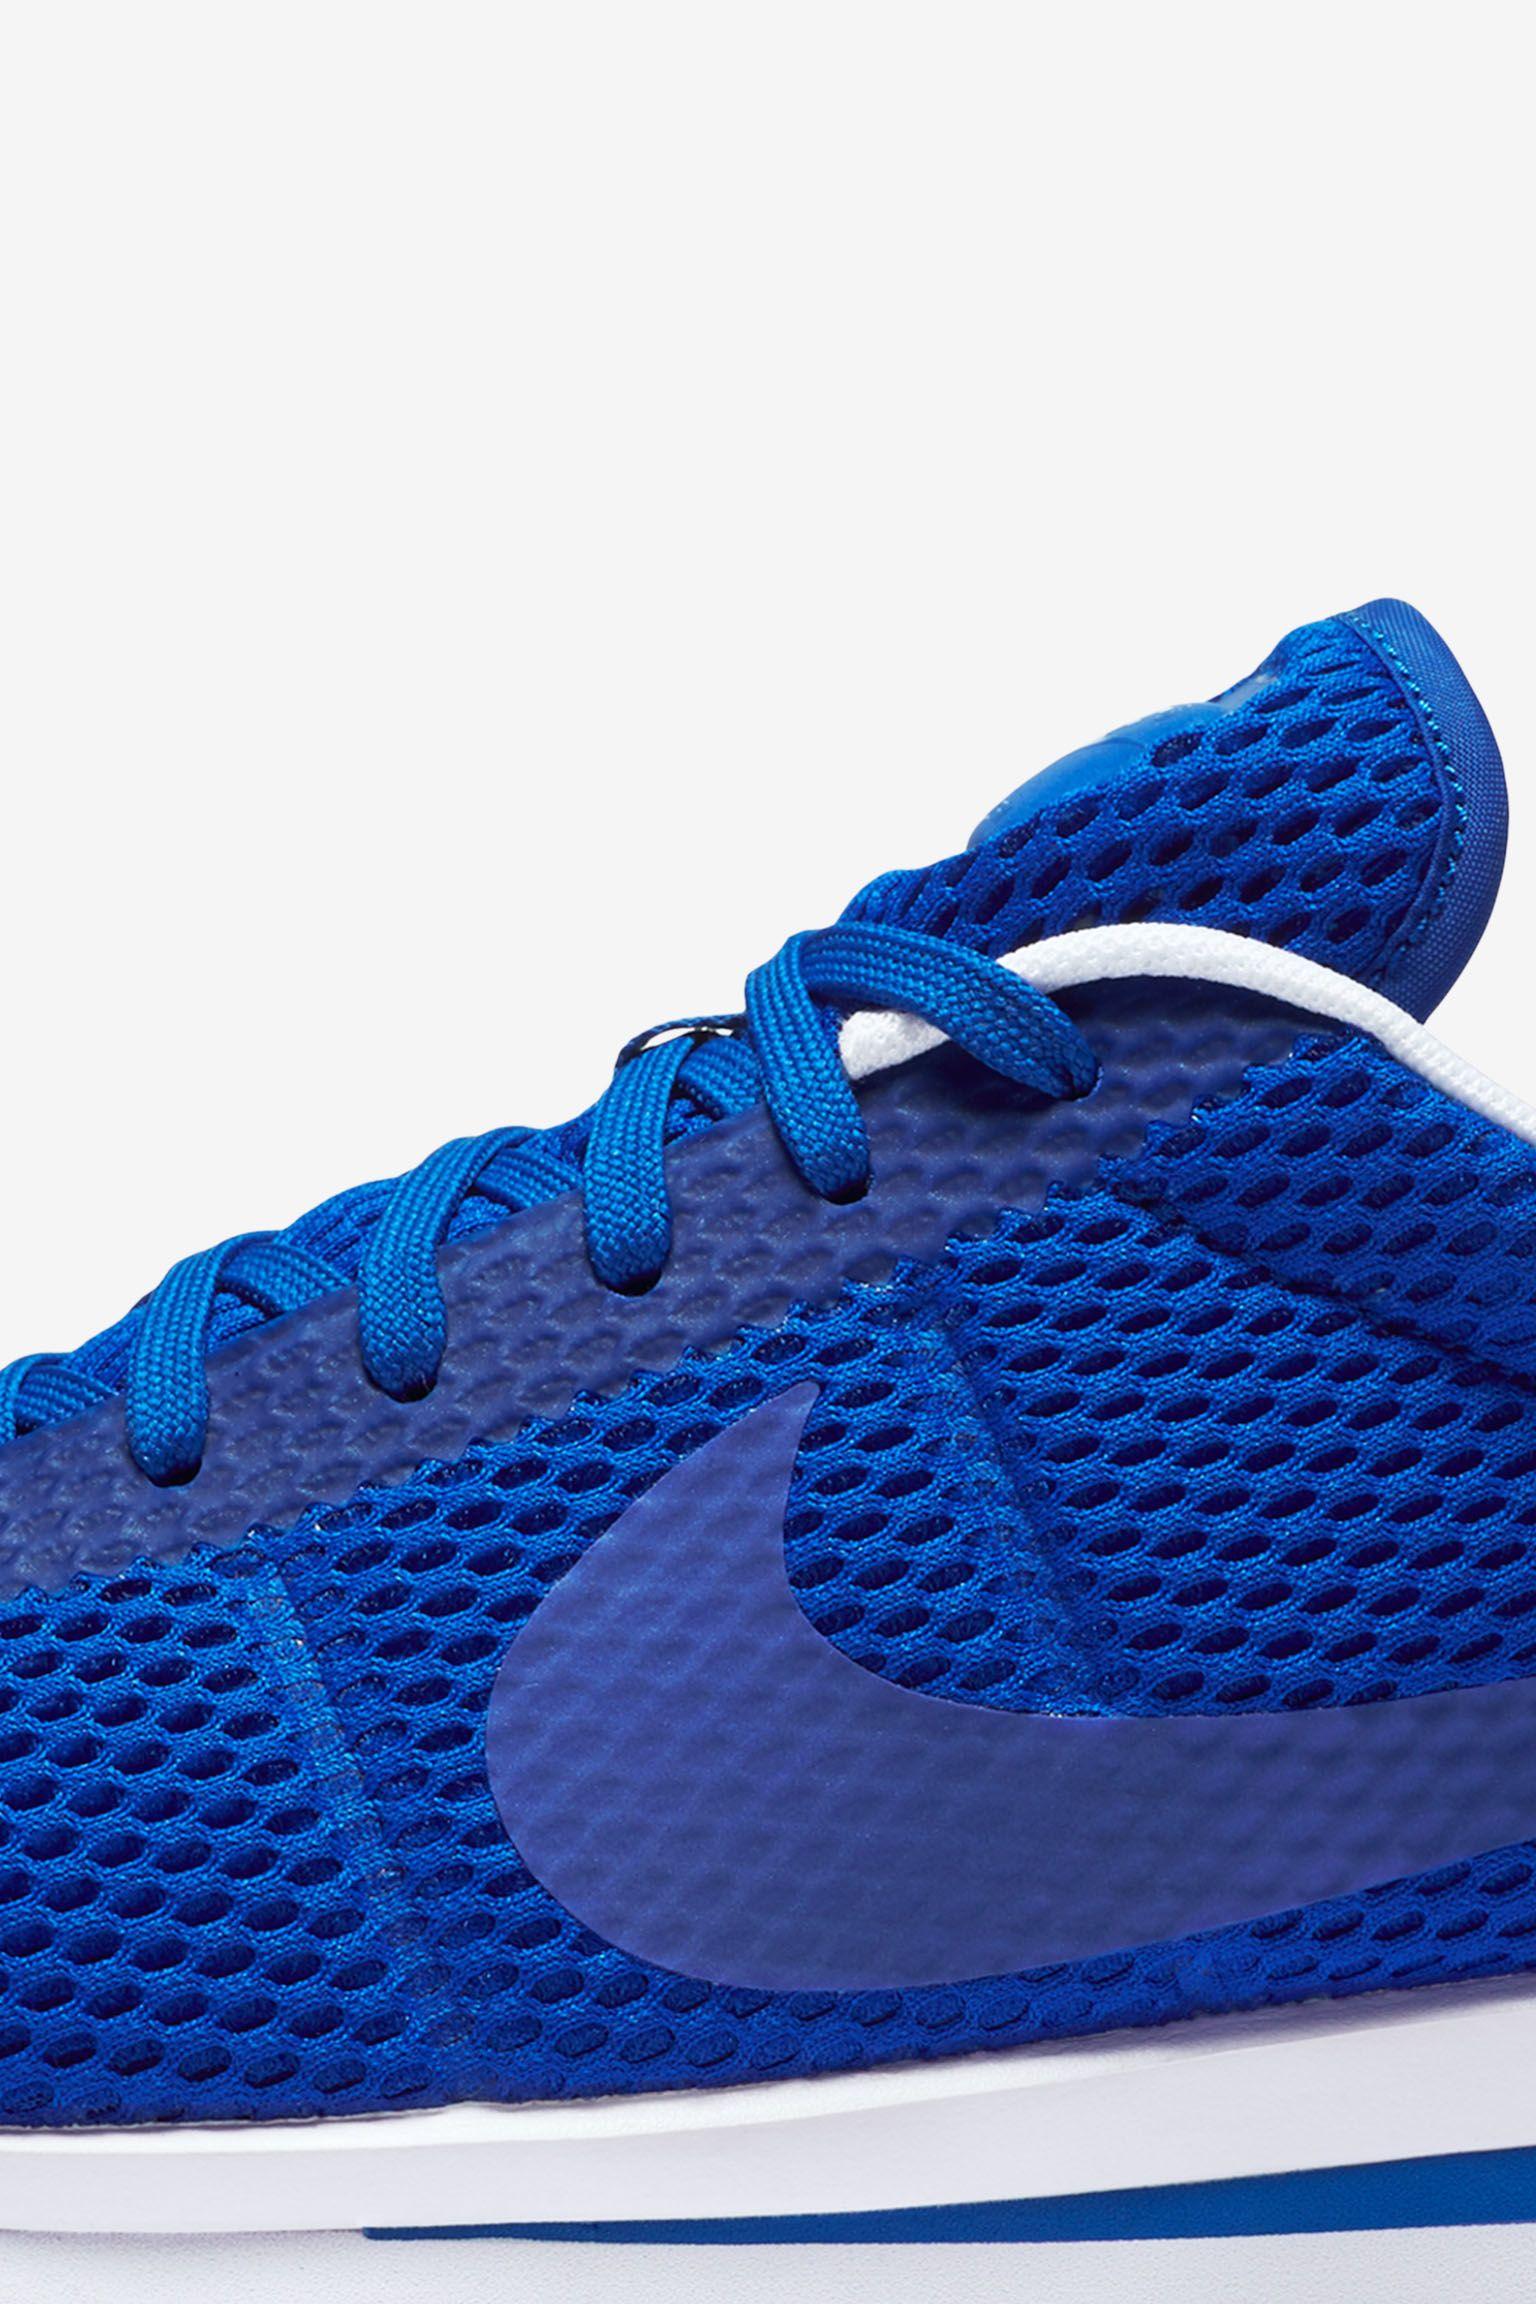 Nike Cortez Ultra Breathe 'Racer Blue'